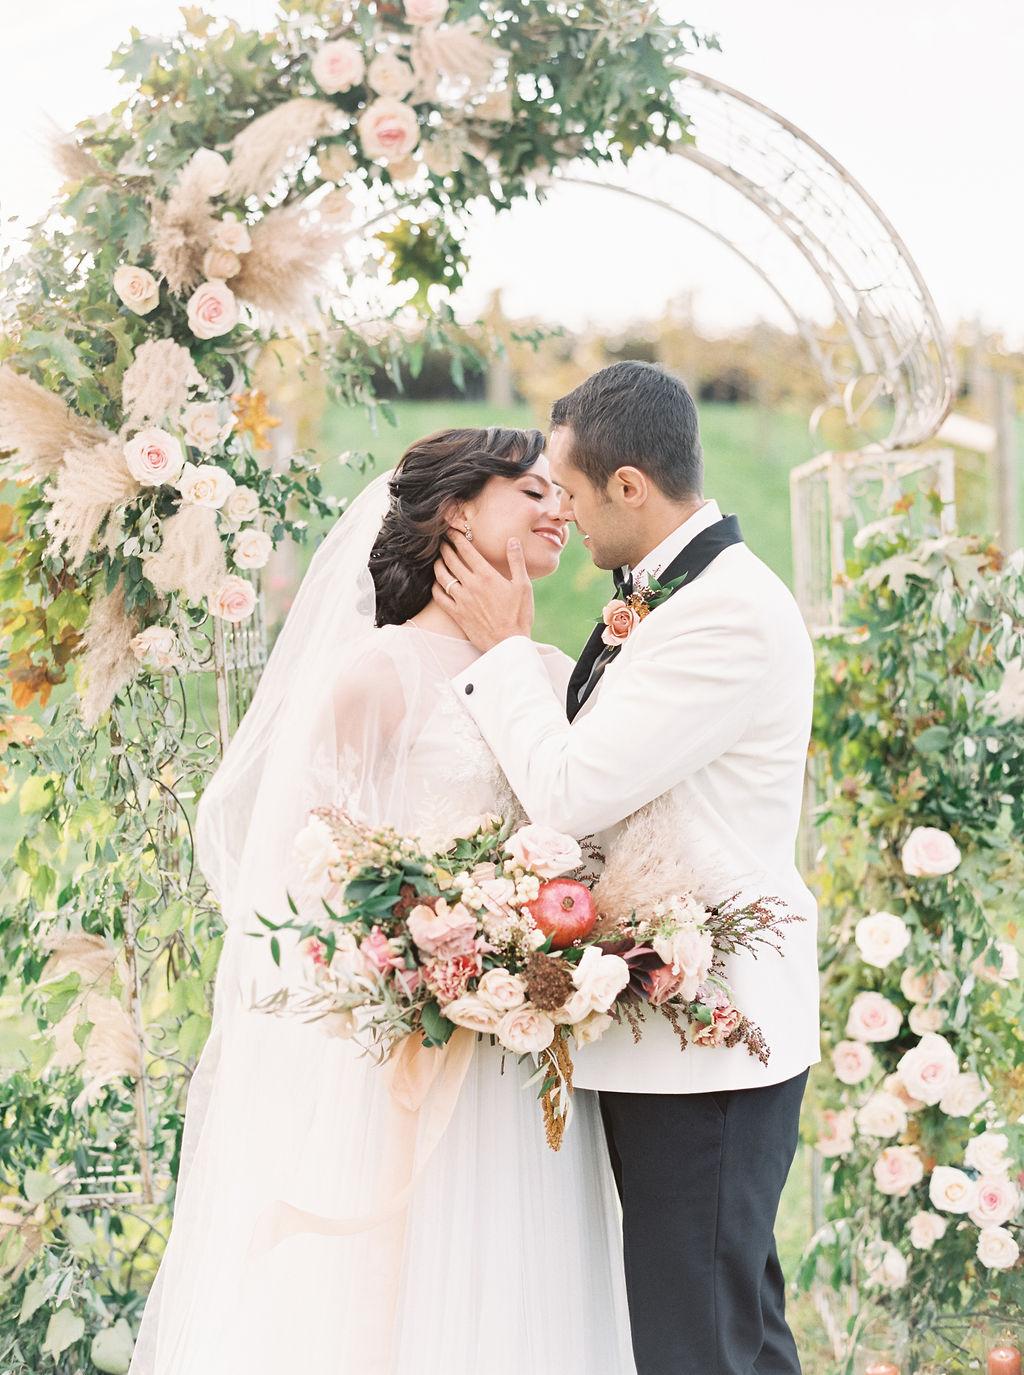 Wedding planning services Philadelphia